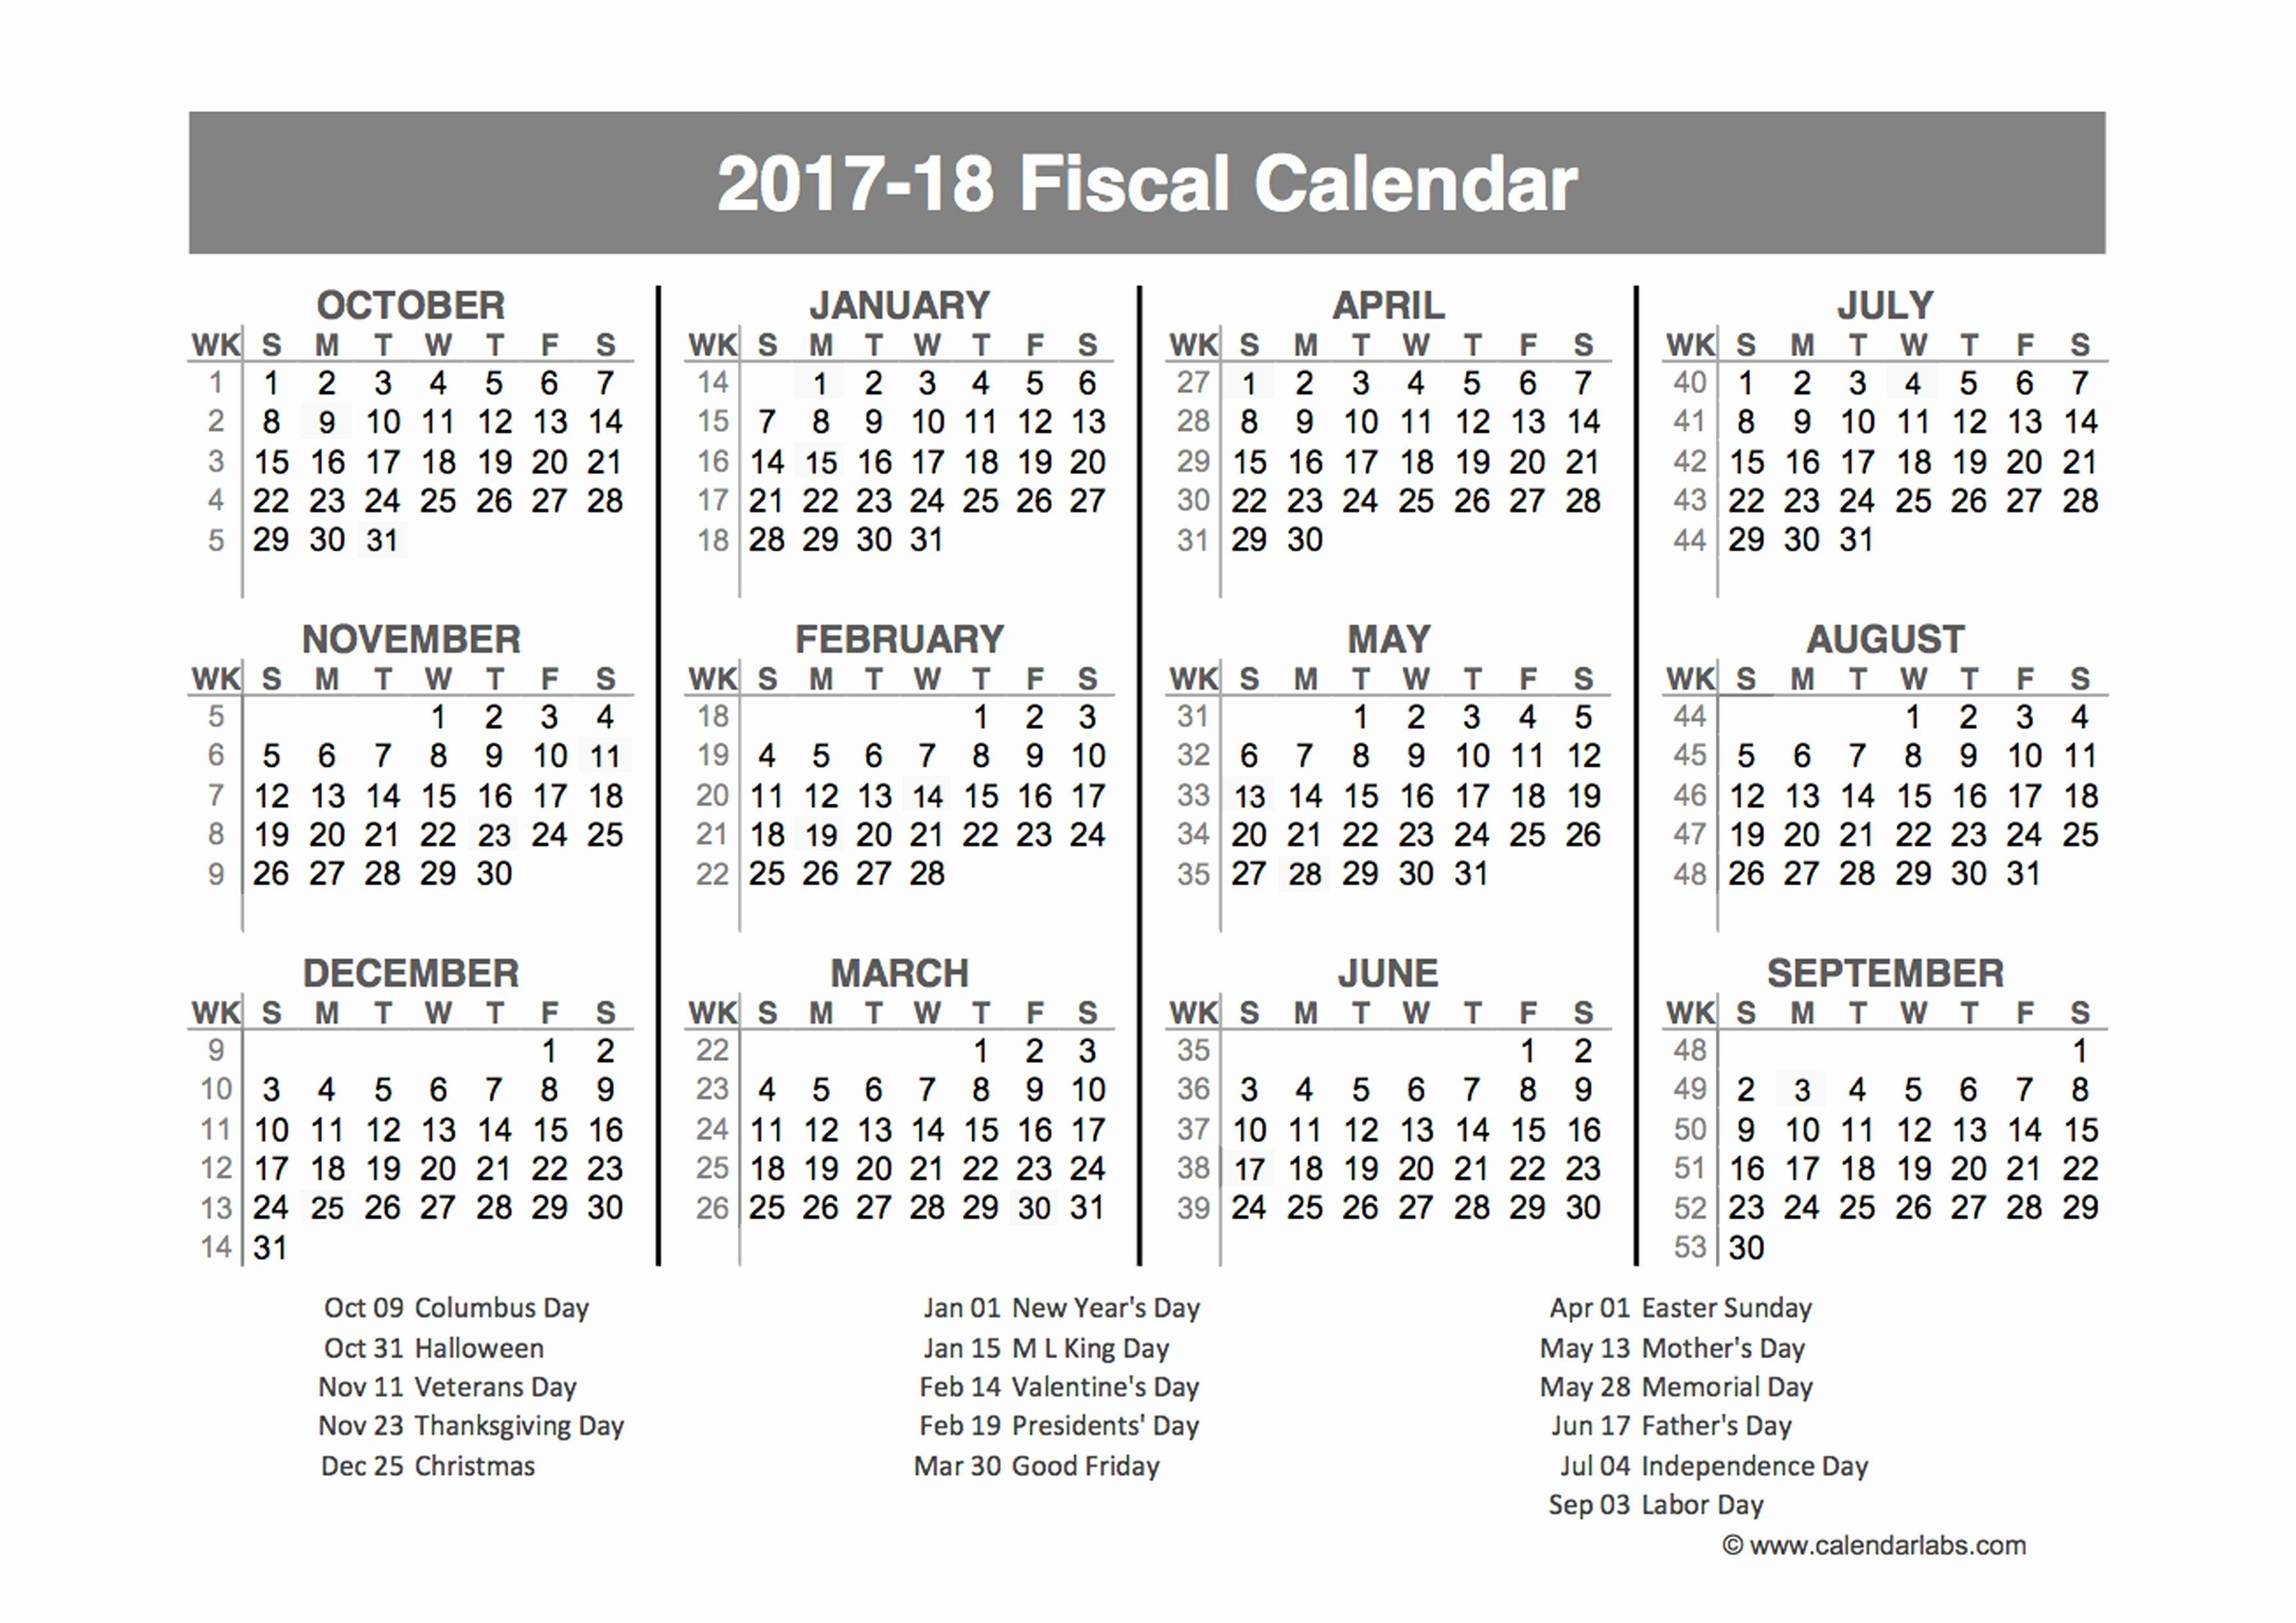 School Calendar 2018 To 2019 Deped Download Hisd 2018 Calendar Calendar 2019 Hisd